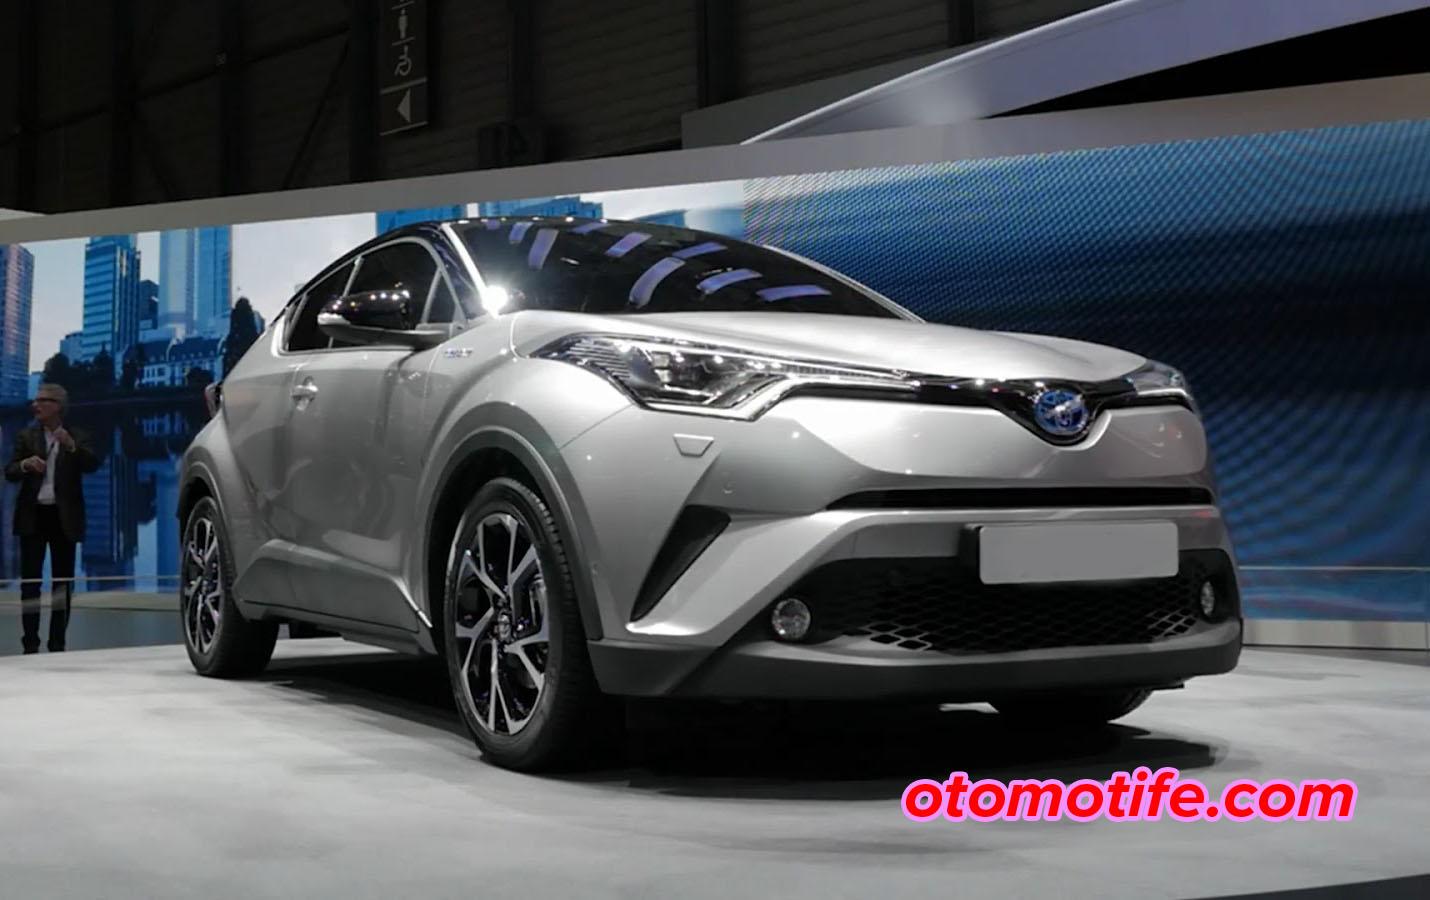 Kapan All New Camry Masuk Indonesia Grand Veloz 1 5 Toyota Chr Automotife